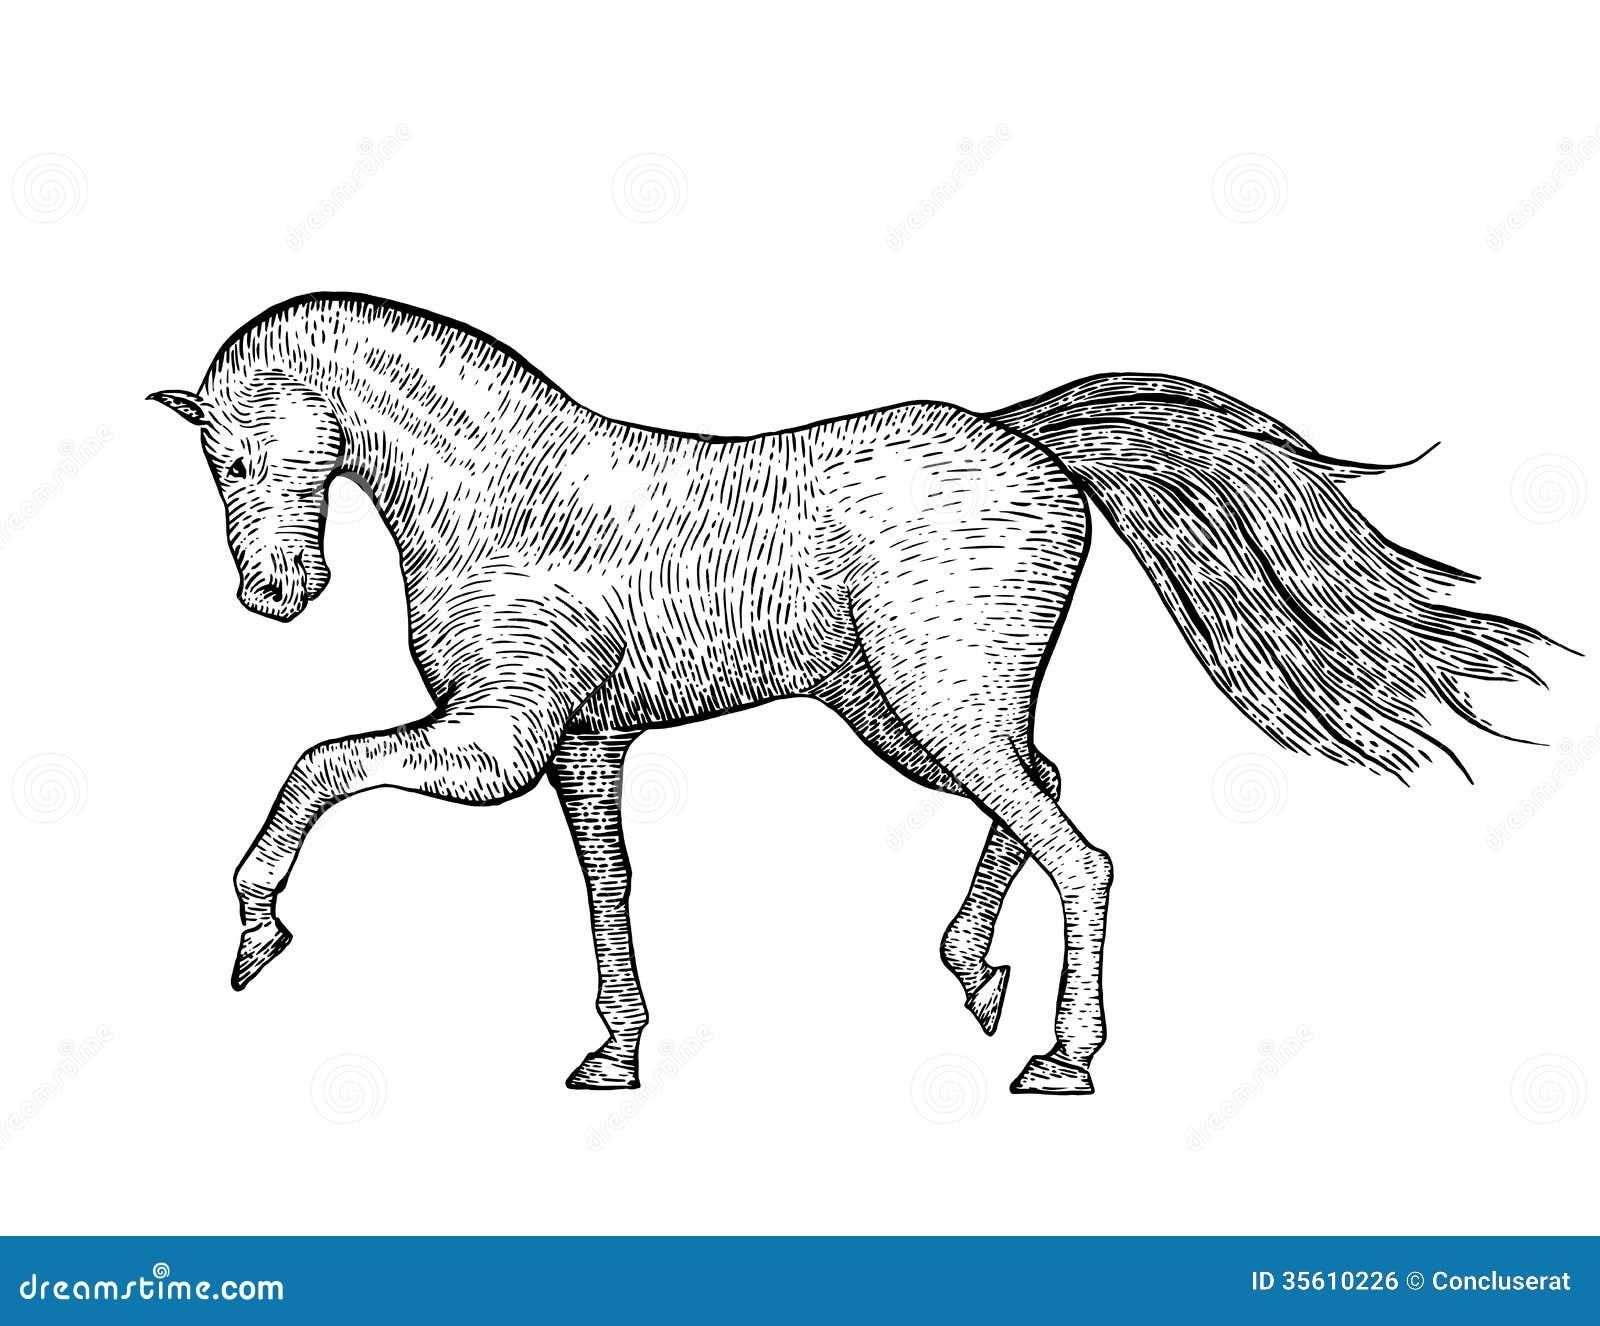 Engraved Vintage Horse Stock Vector Illustration Of